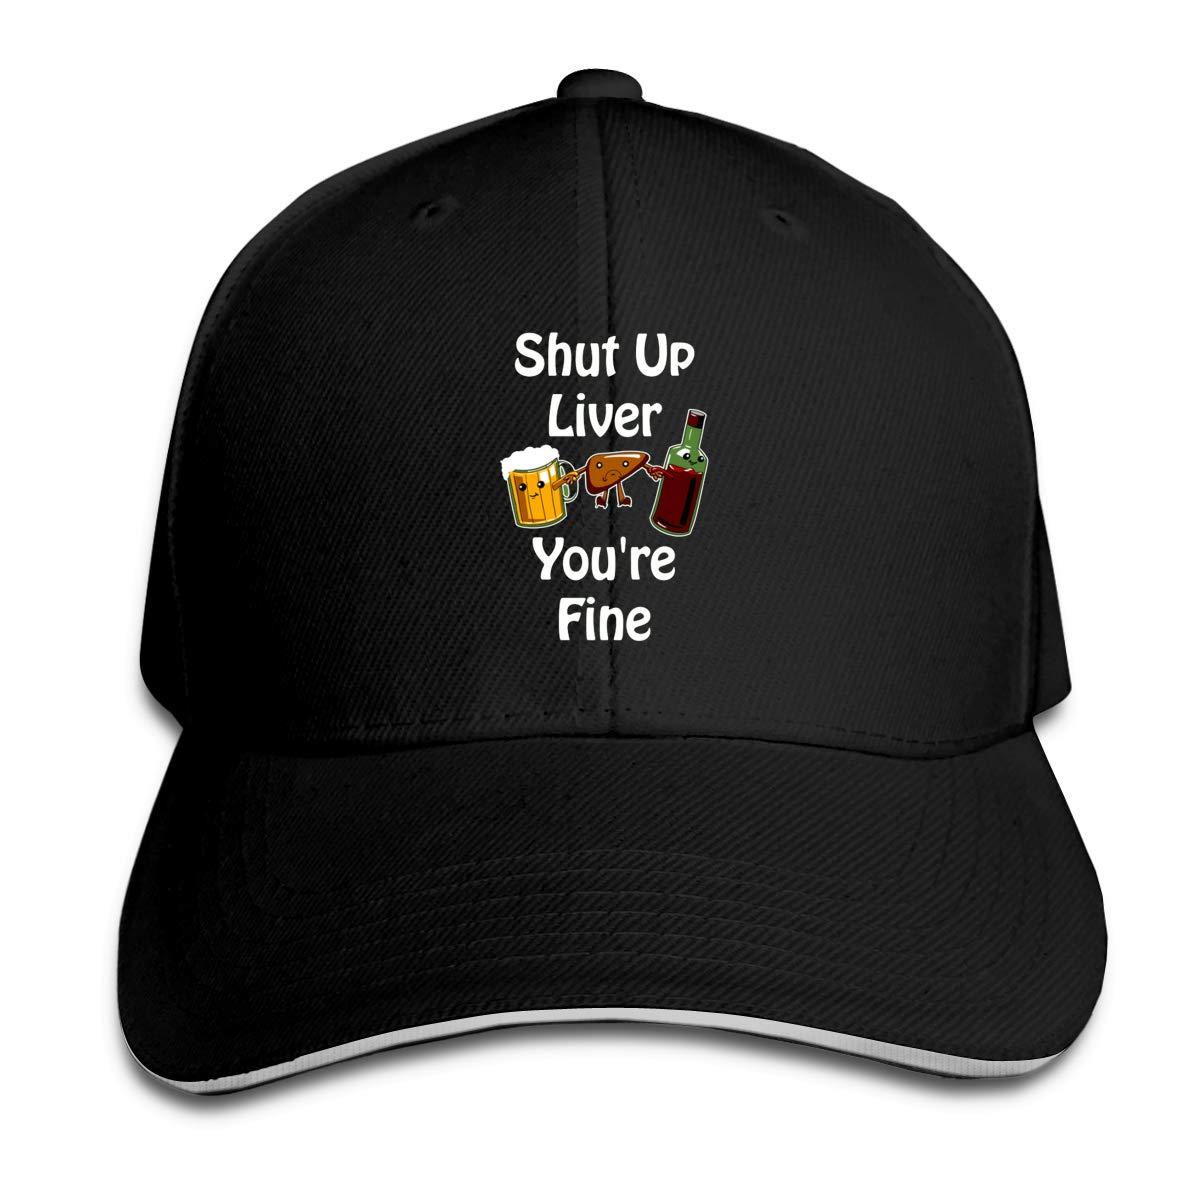 Shut Up Liver Youre Fine Classic Adjustable Cotton Baseball Caps Trucker Driver Hat Outdoor Cap Black